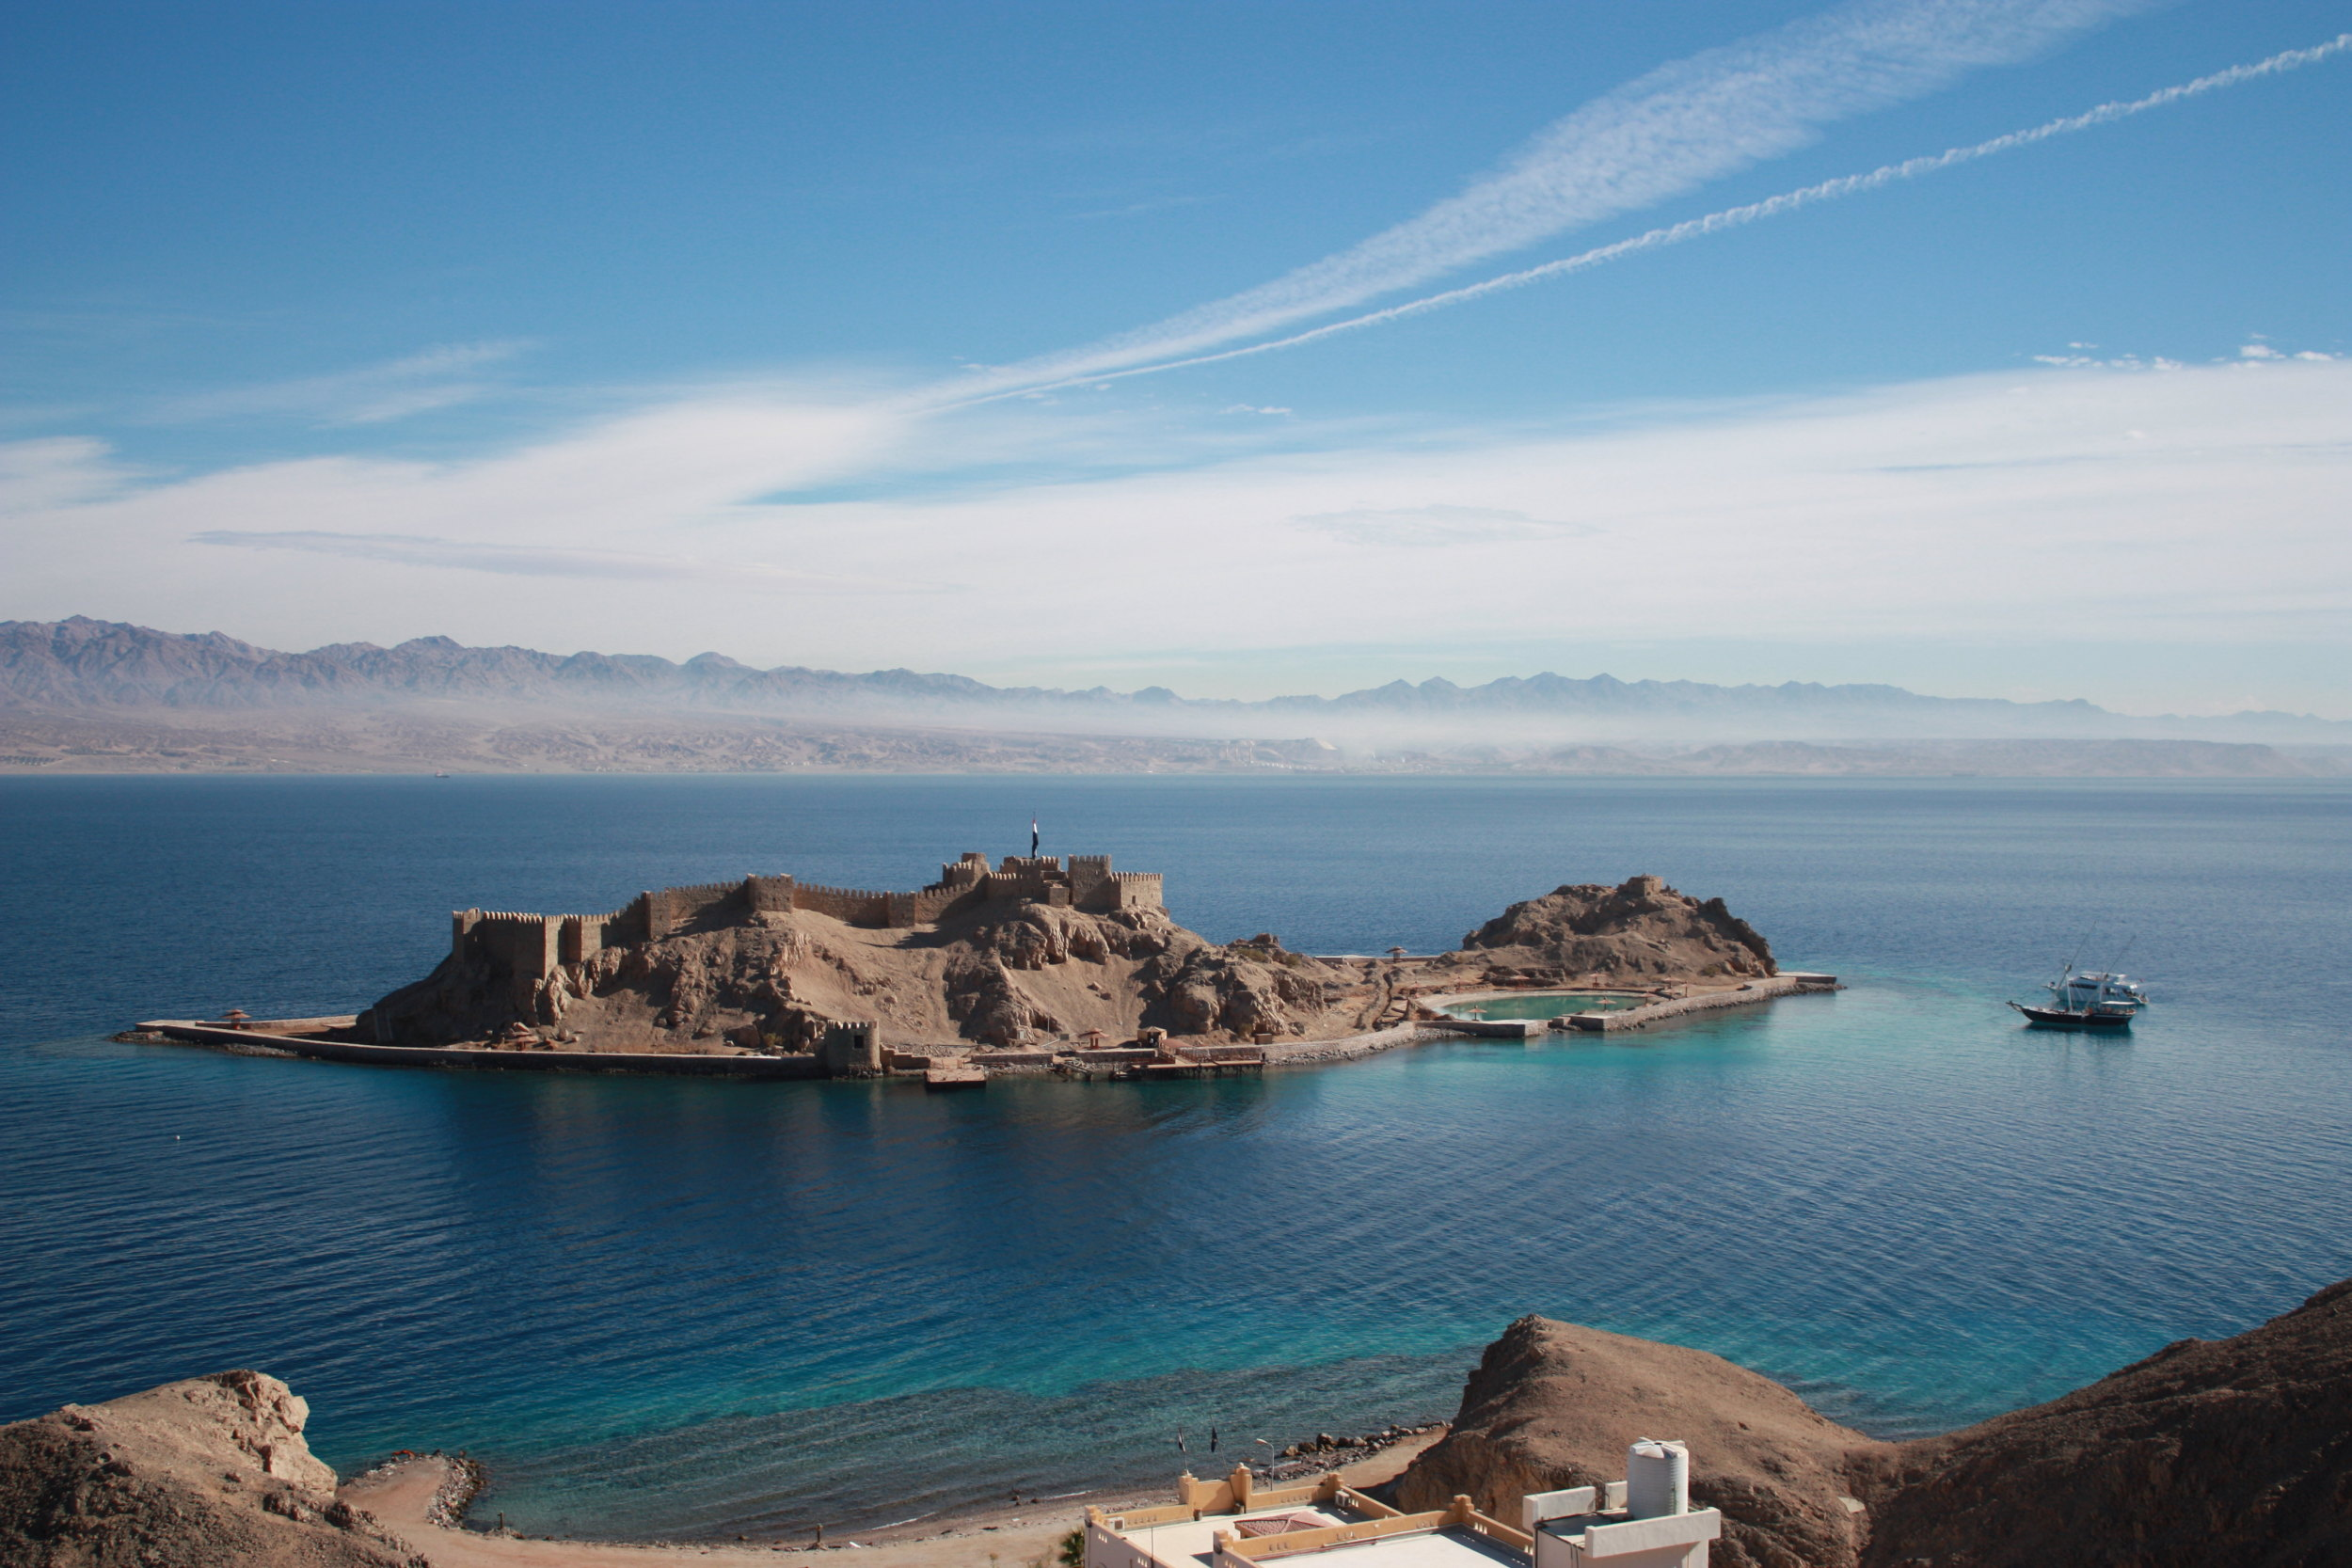 Pharaoh's Island, Sinai, Egypt